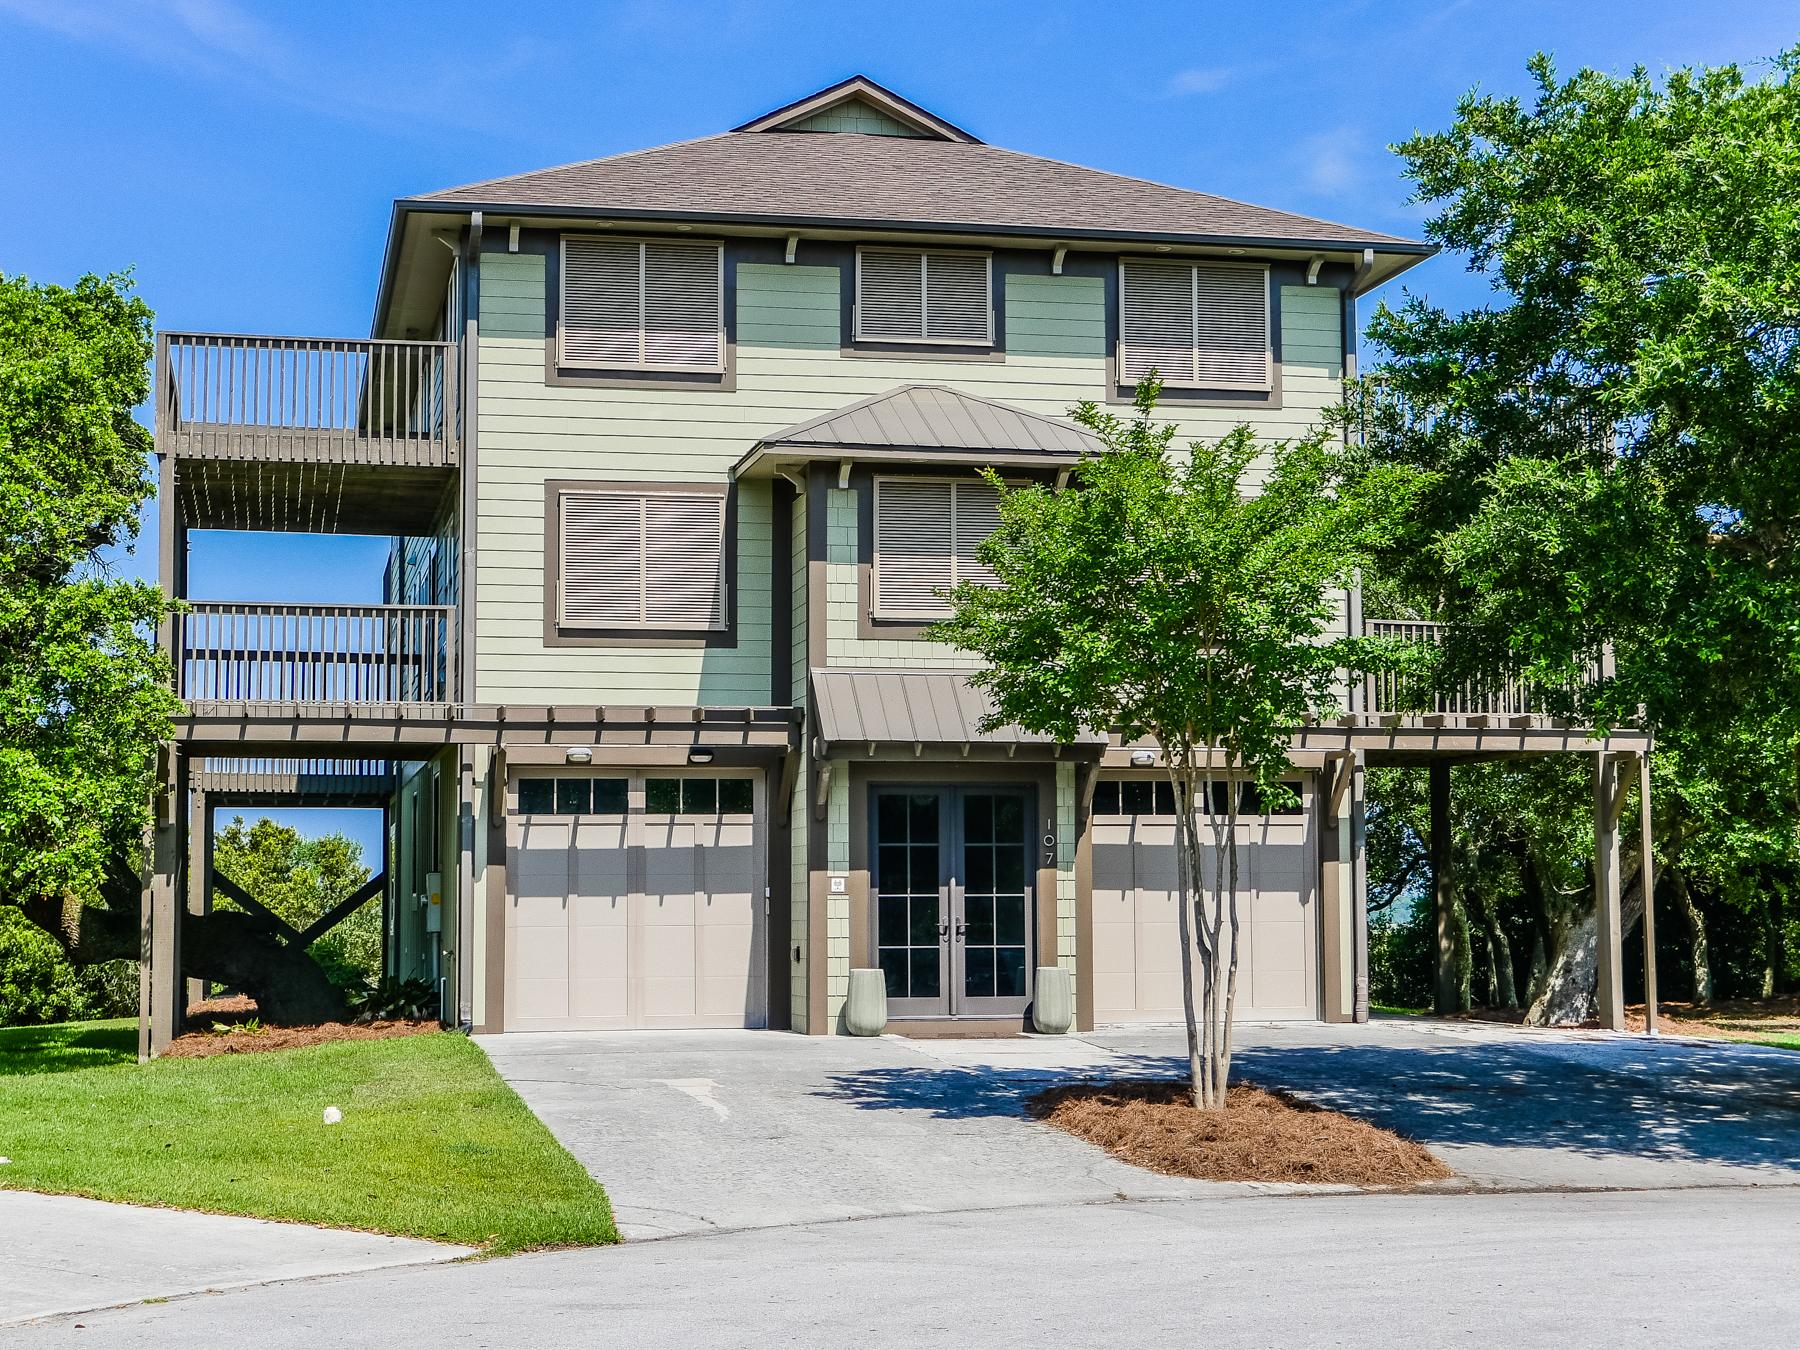 獨棟家庭住宅 為 出售 在 Sophisticated Style in a Harmonious Setting 107 Twilight Court Surf City, 北卡羅來納州 28445 美國